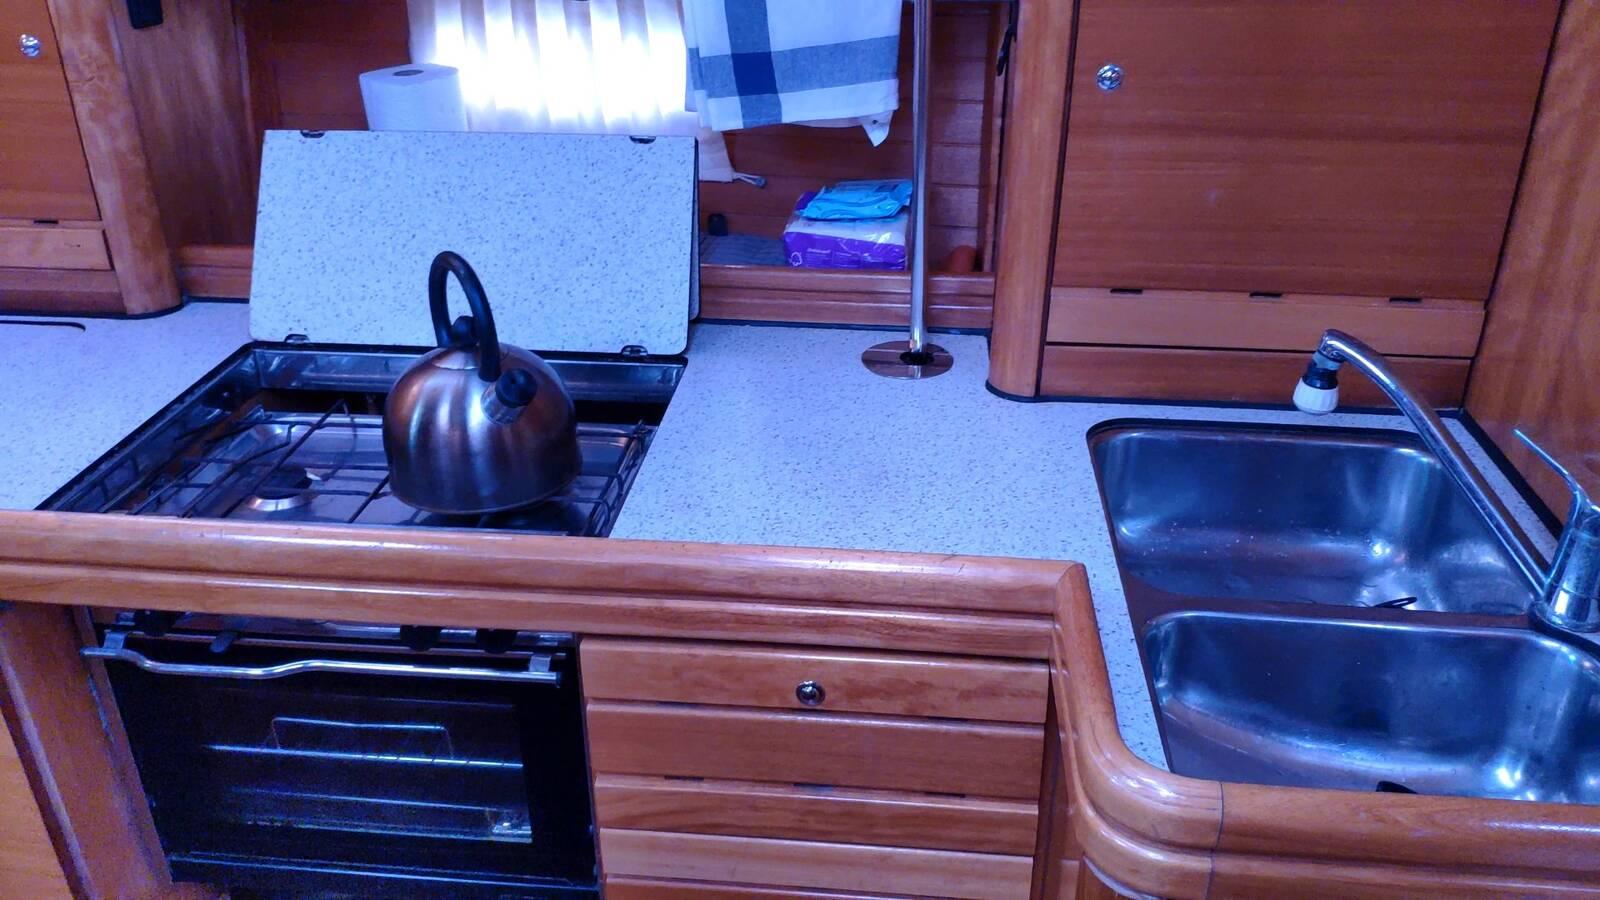 Galley Bavaria 37 Cruiser Yacht for sale